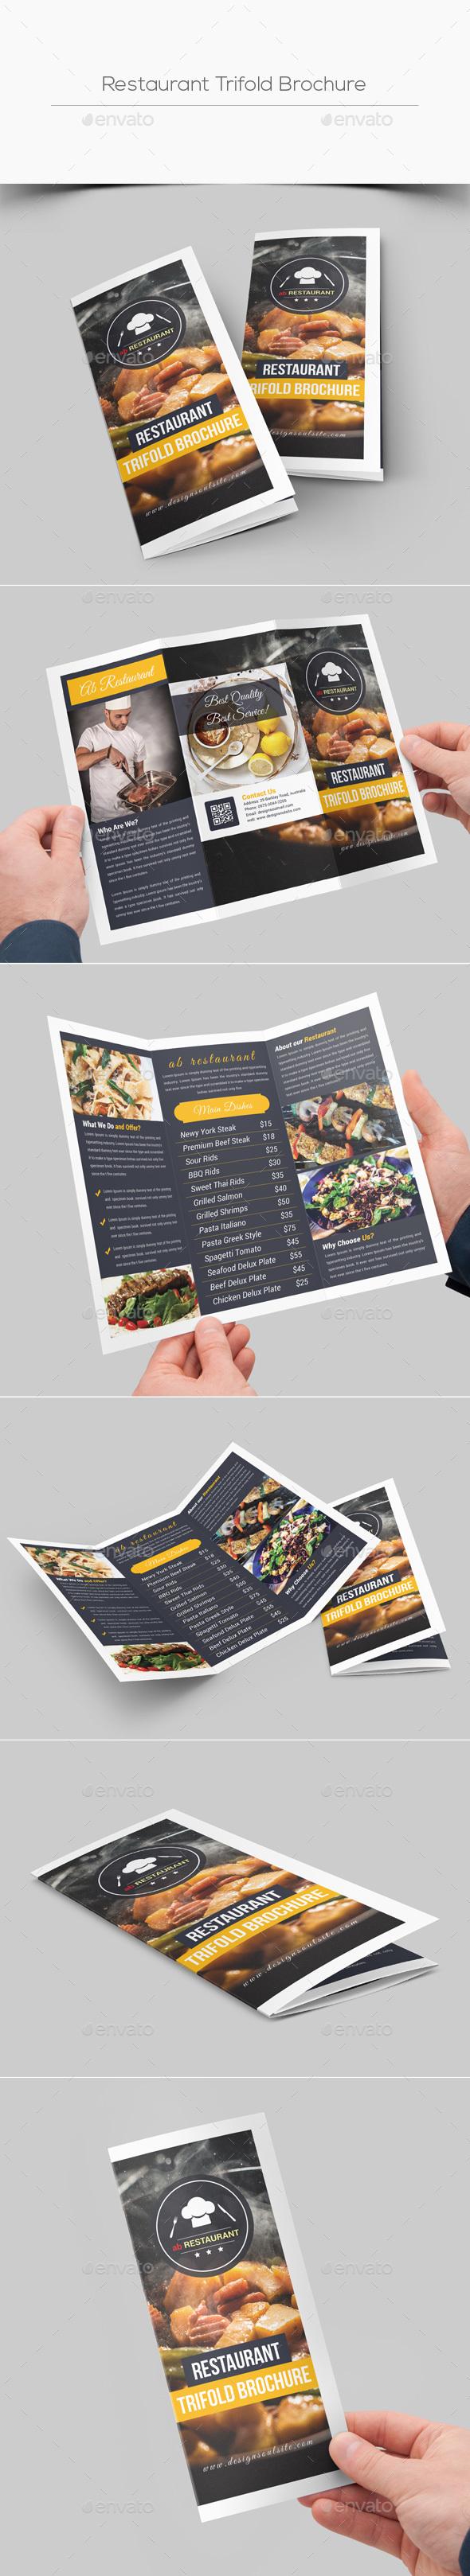 Restaurant Trifold Brochure - Corporate Brochures